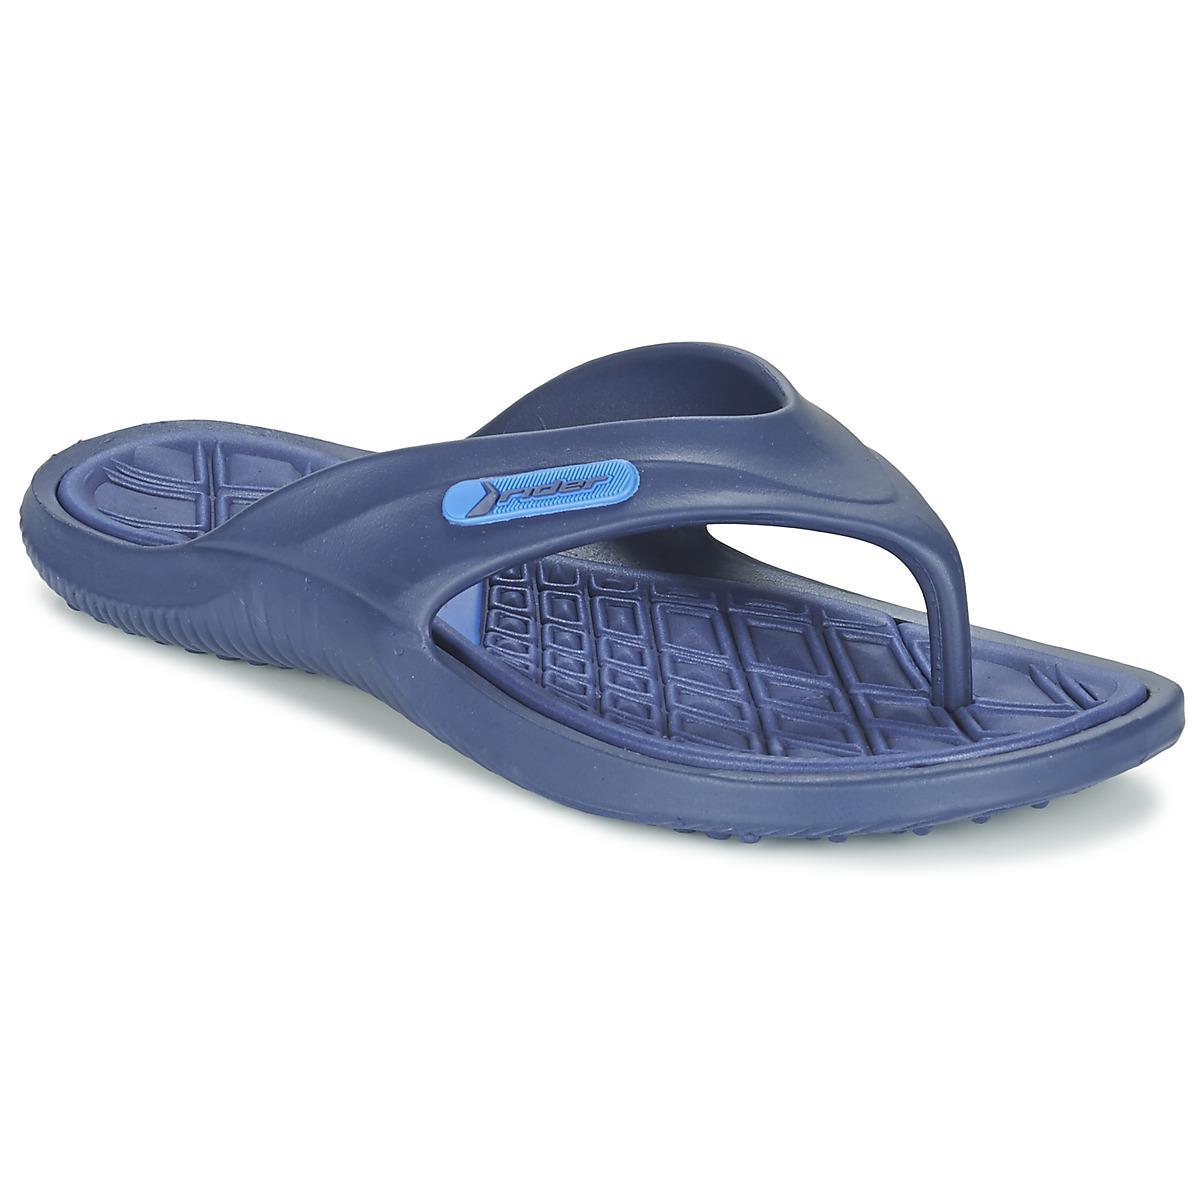 3606011e52 Rider Cape X Ad Flip Flops / Sandals (shoes) in Blue for Men - Lyst